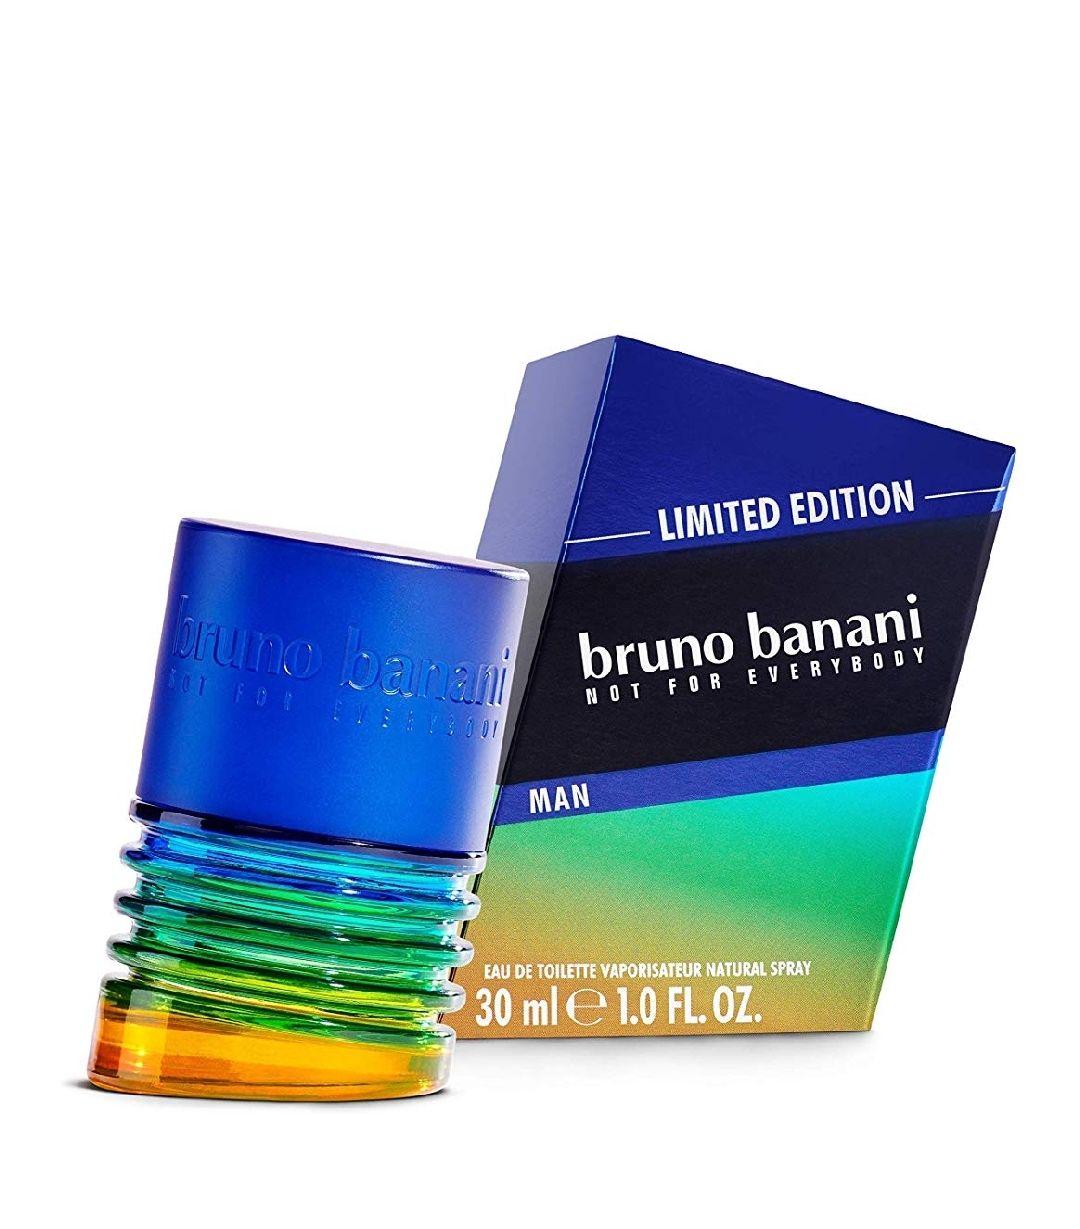 Bruno Banani 30 ml